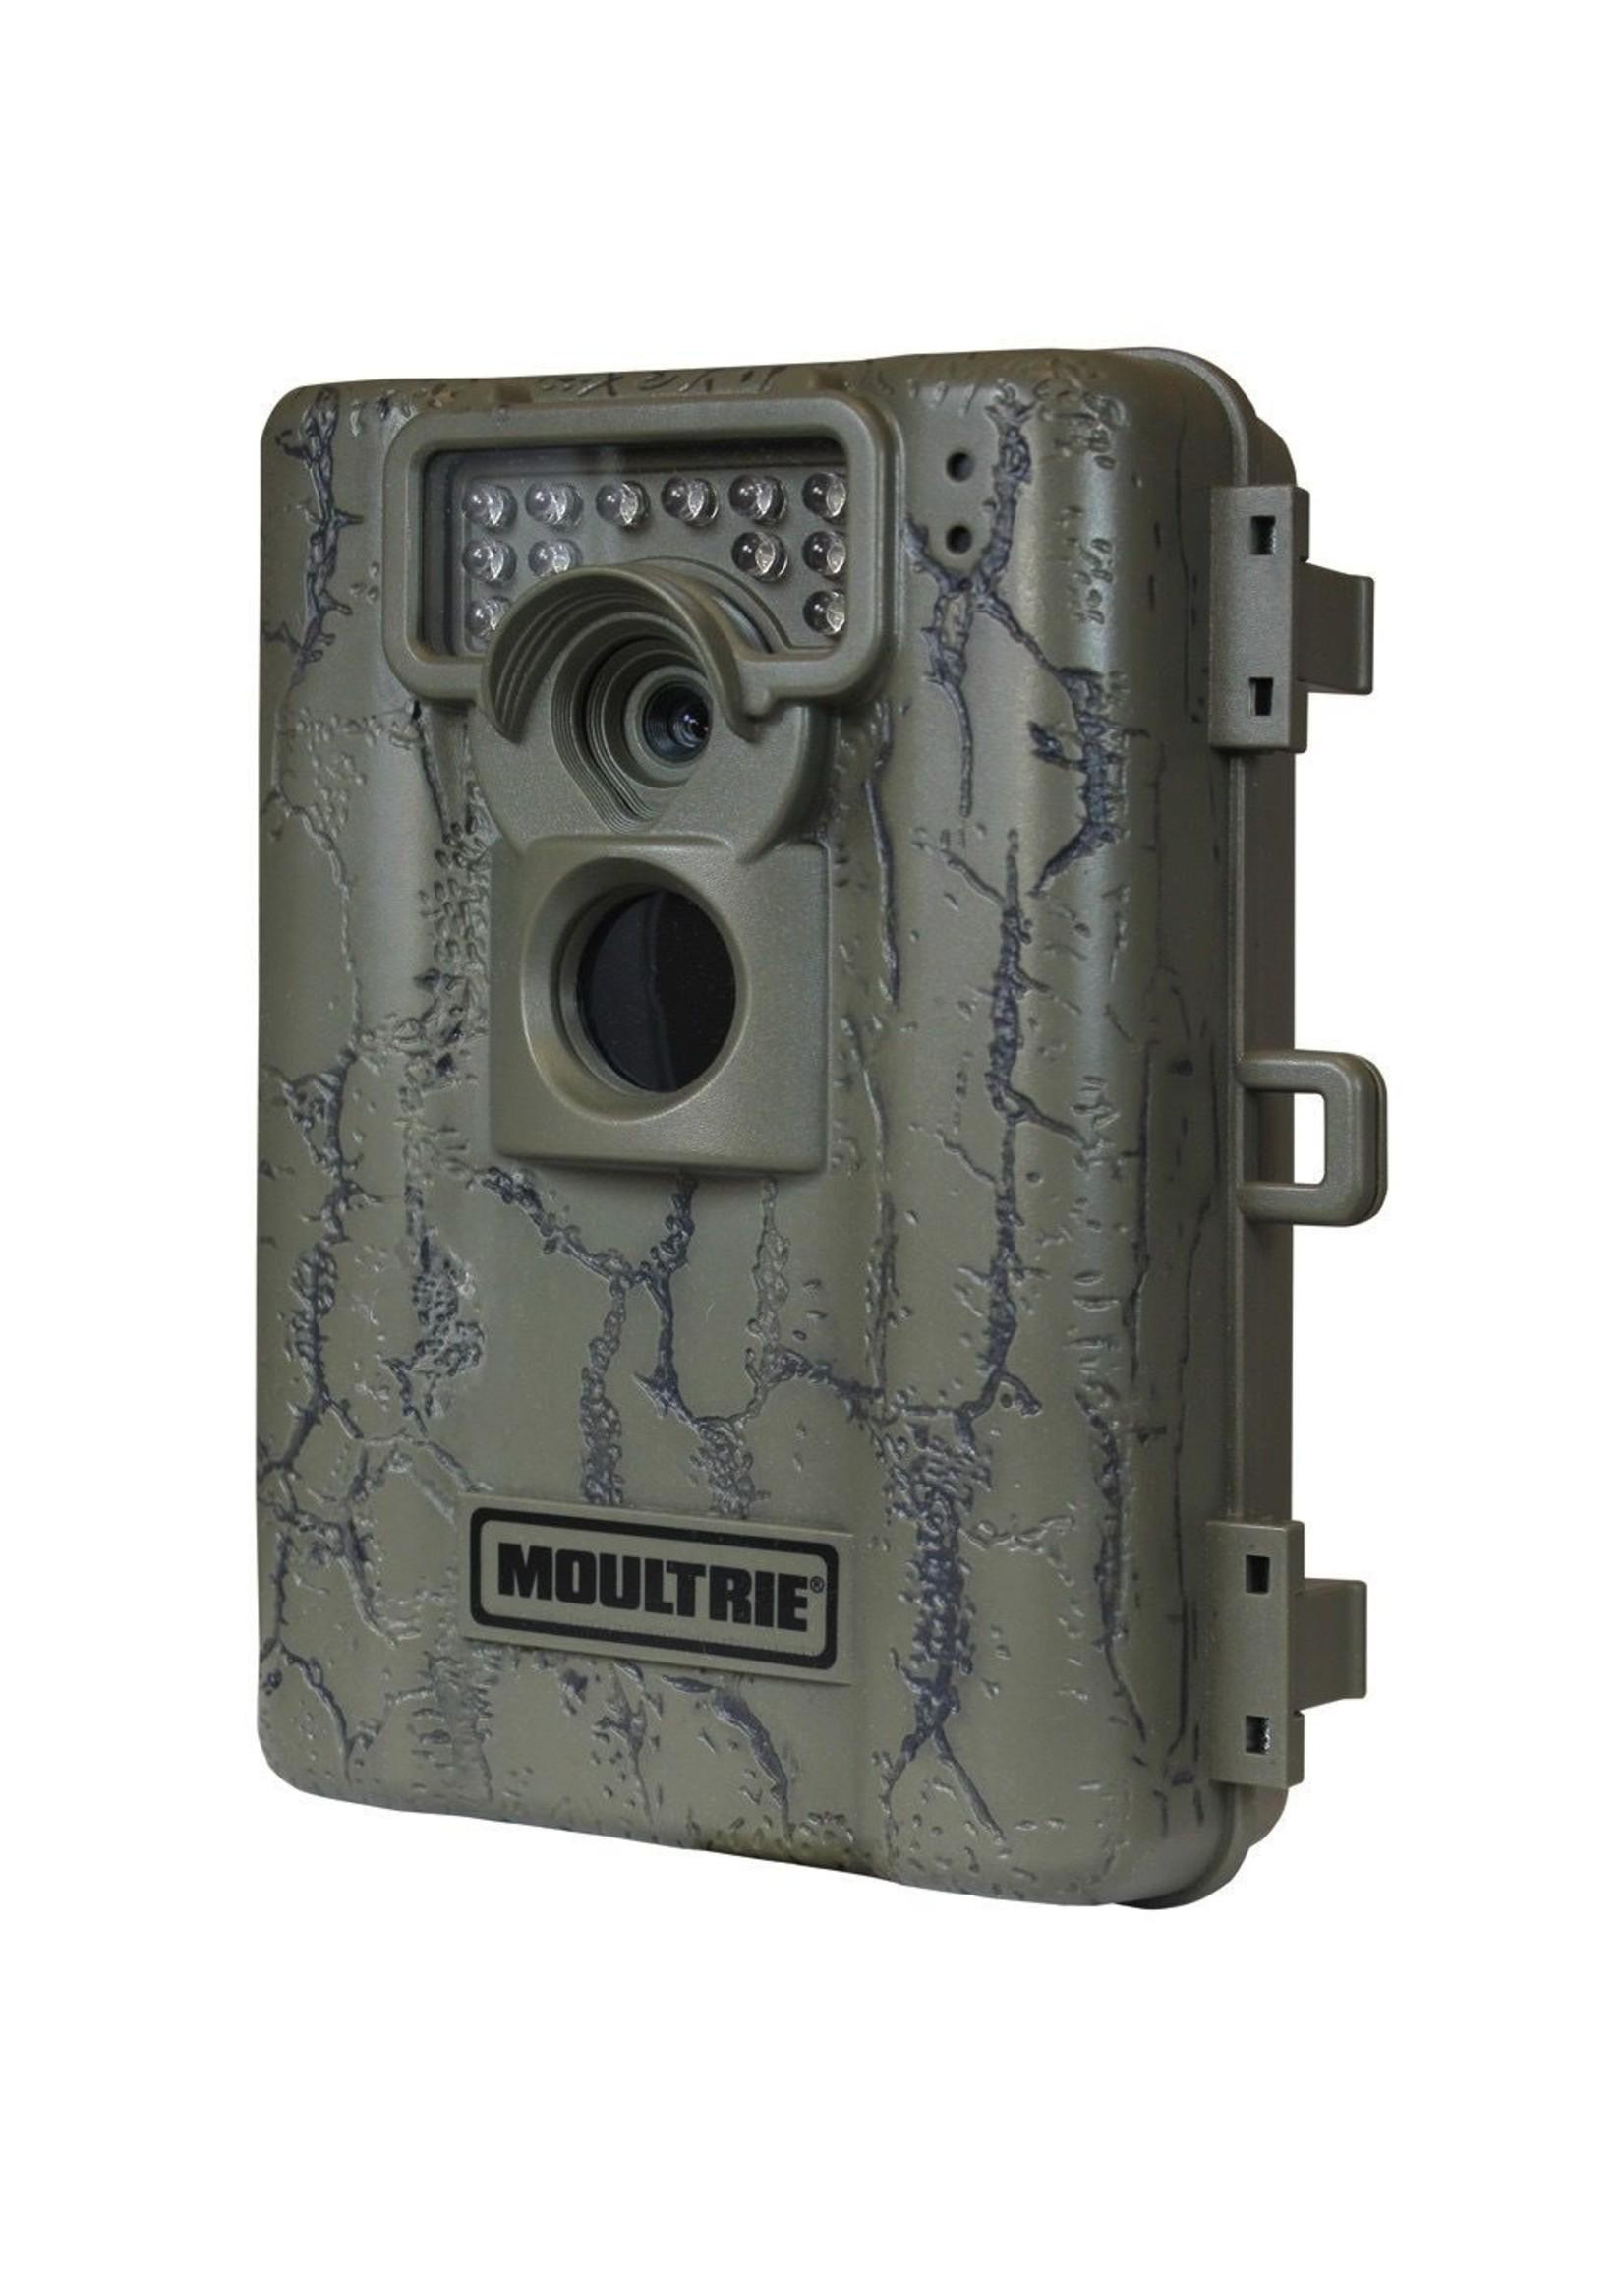 Moultrie Moultrie A5 Gen2 Trail Camera